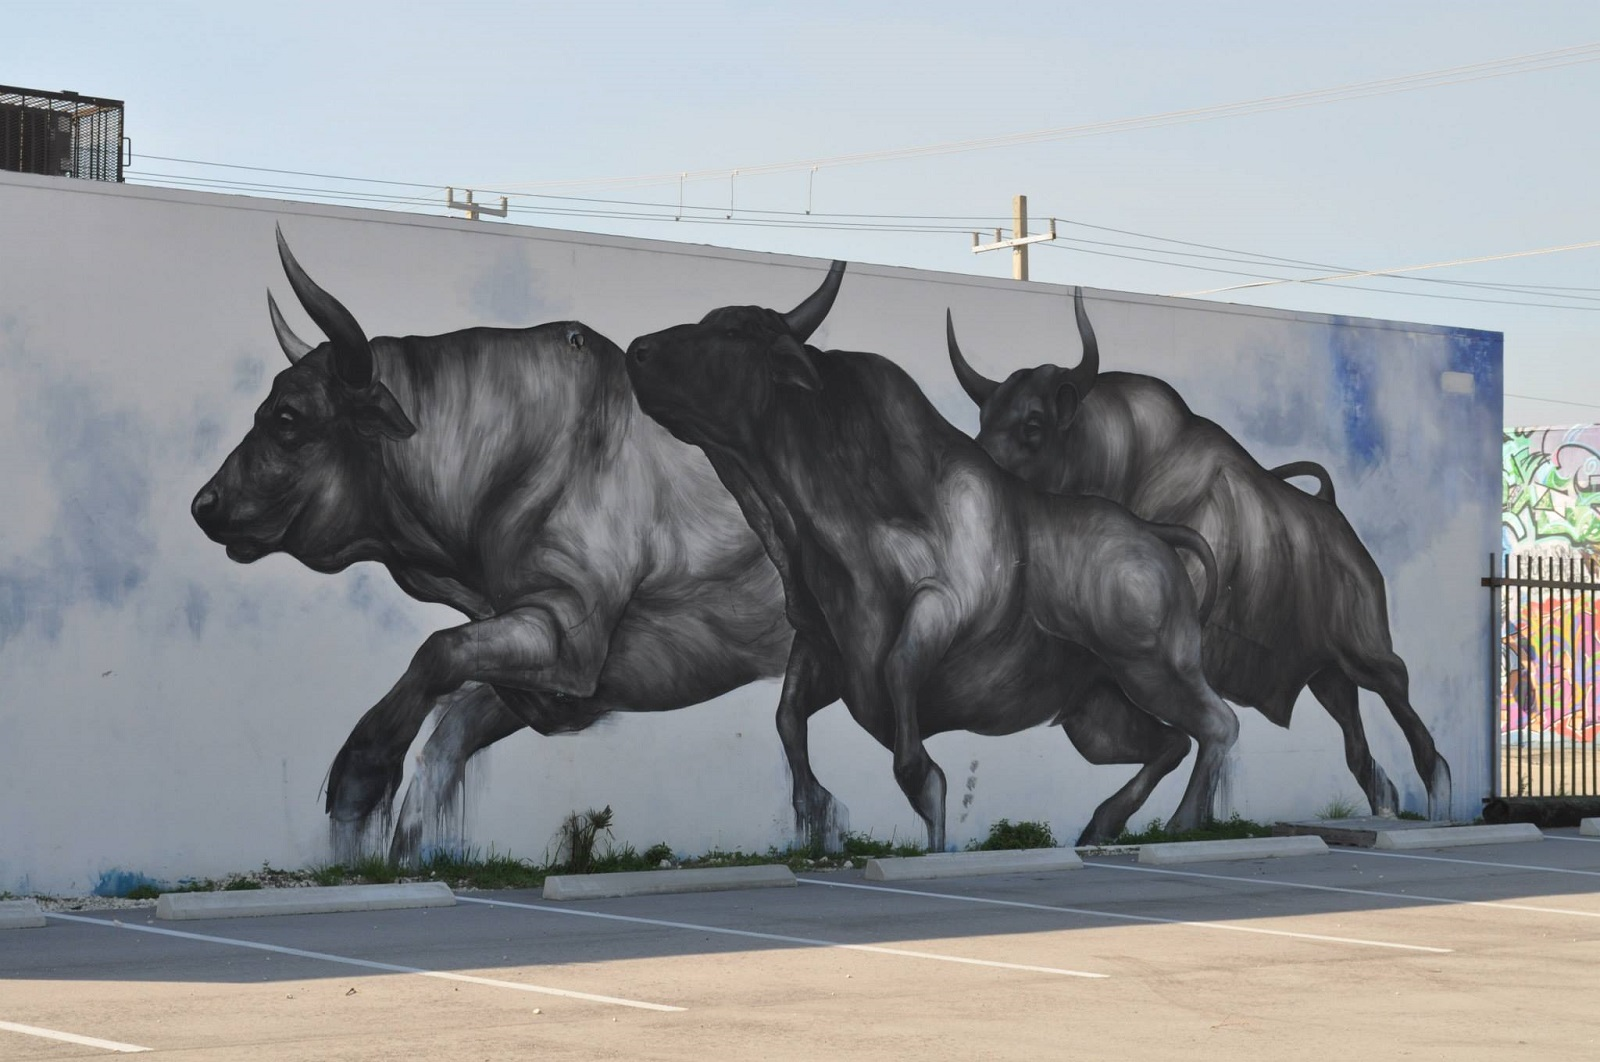 evoca1-new-mural-at-art-basel-2014-03